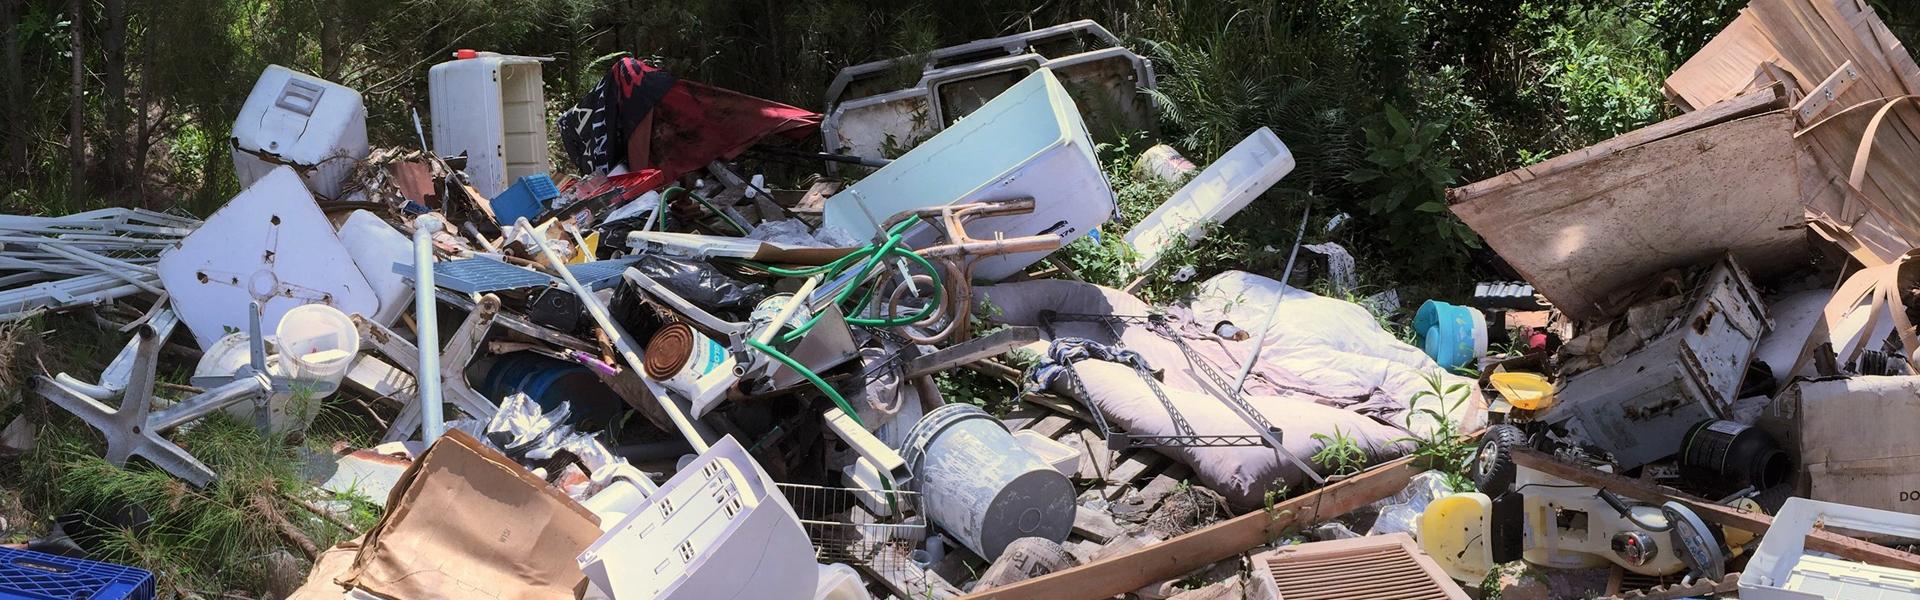 Illegal Dumping Bermuda